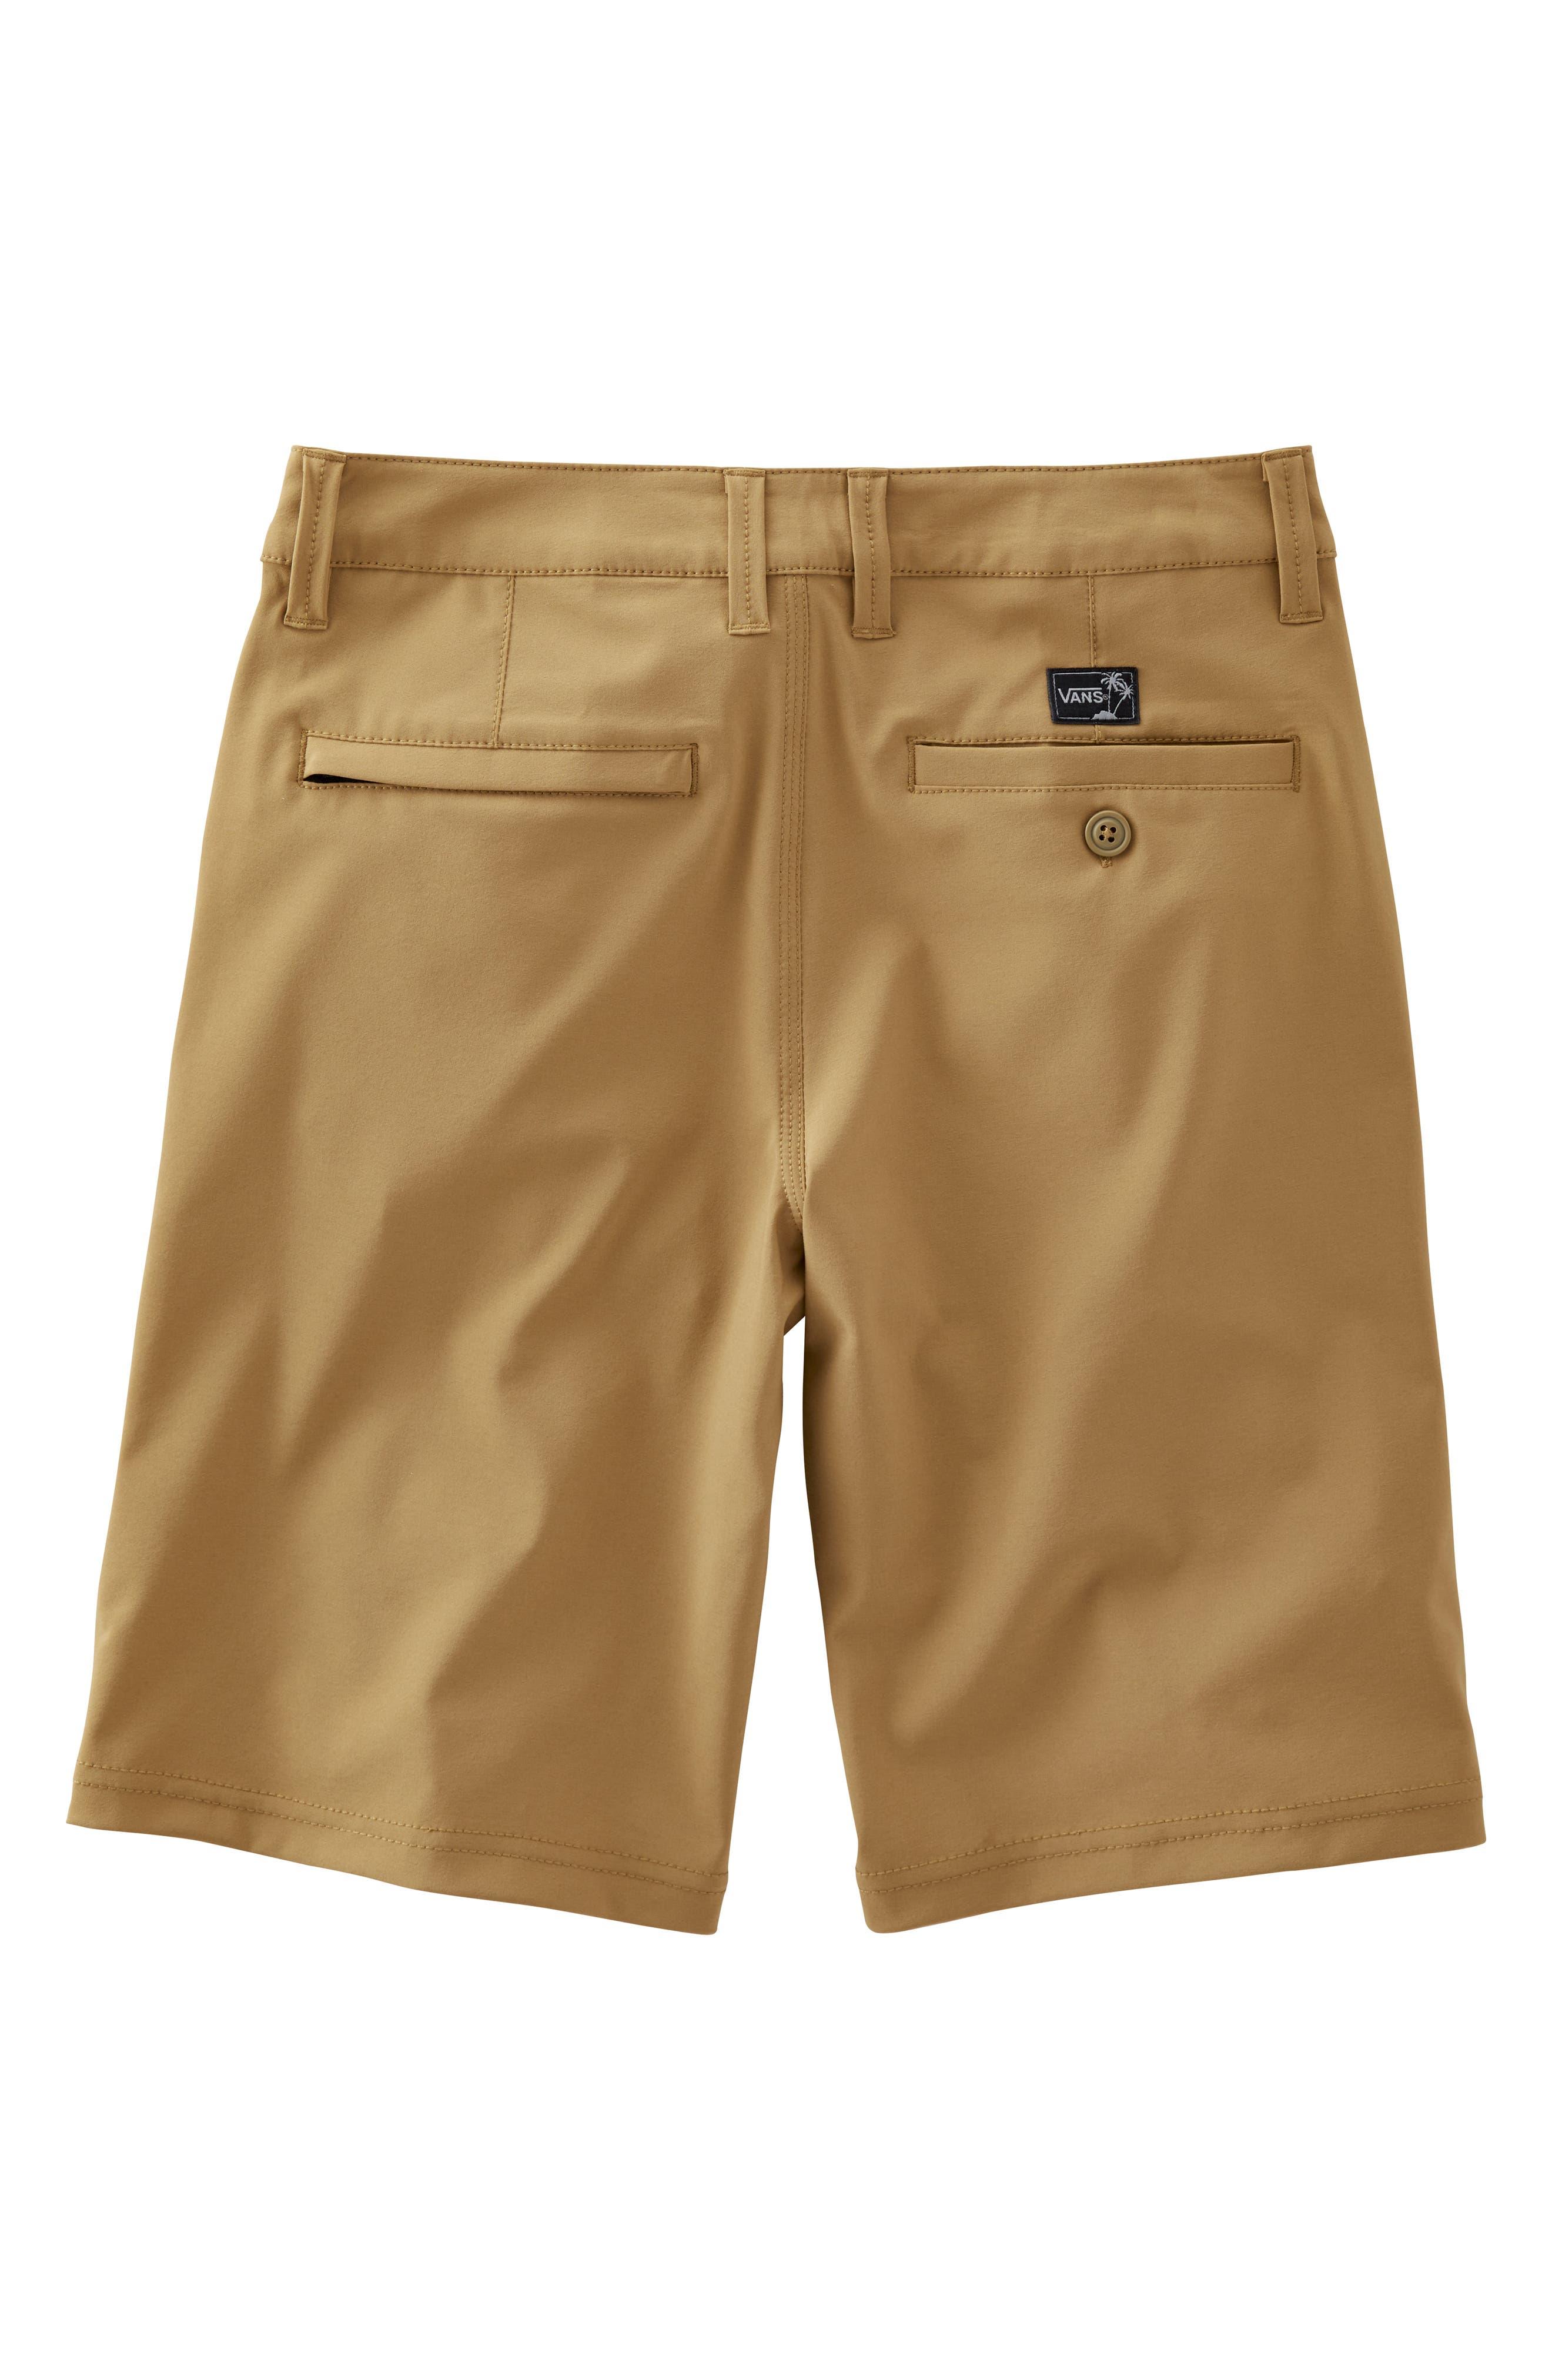 Authentic Decksider Hybrid Shorts,                             Alternate thumbnail 4, color,